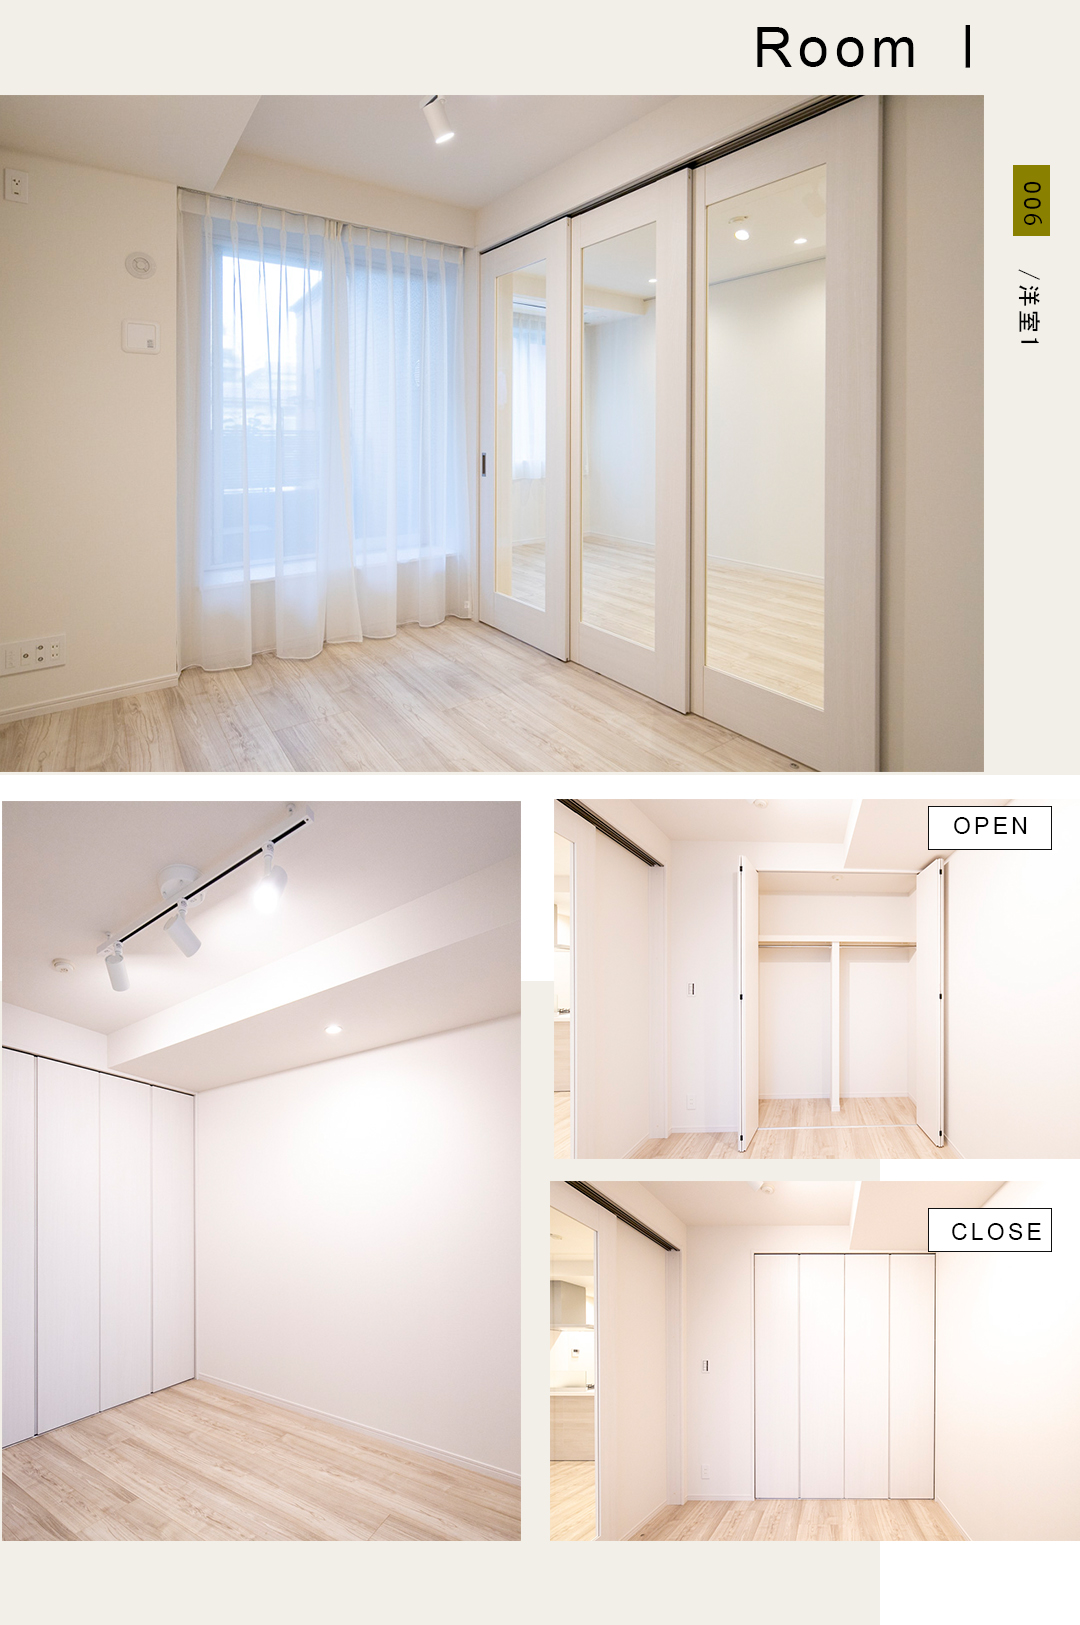 006,RoomI,洋室1